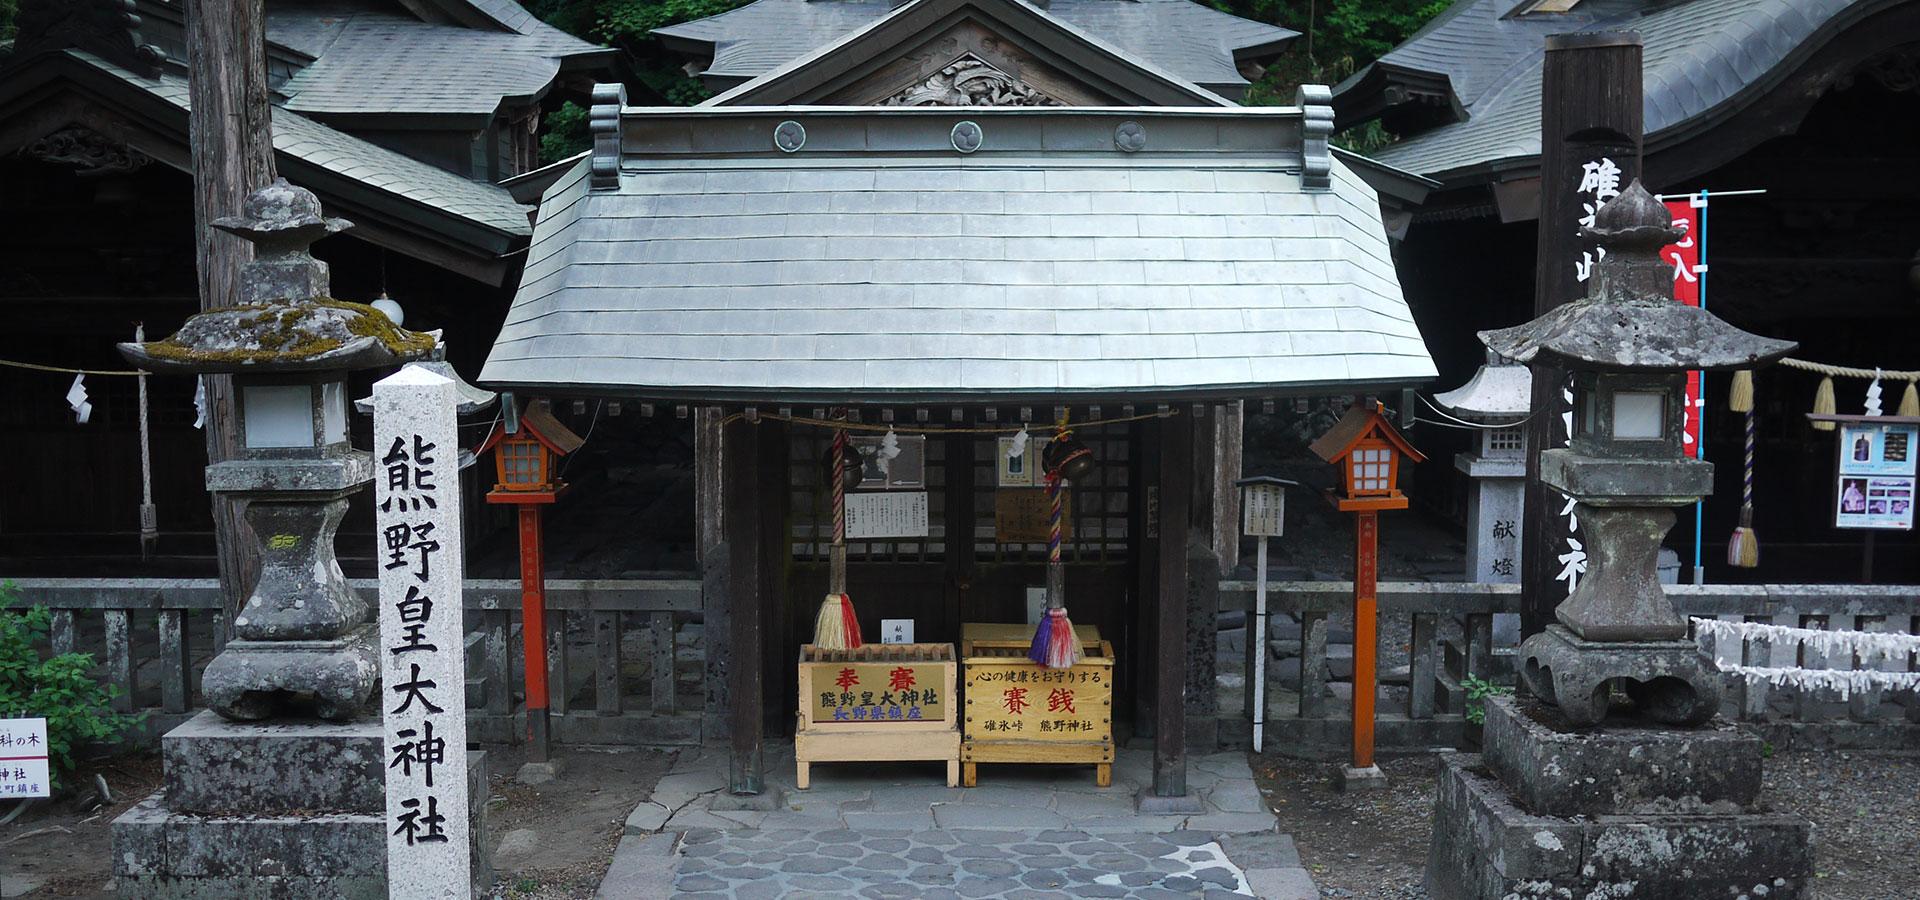 Karuizawa Area Sightseeing Guide